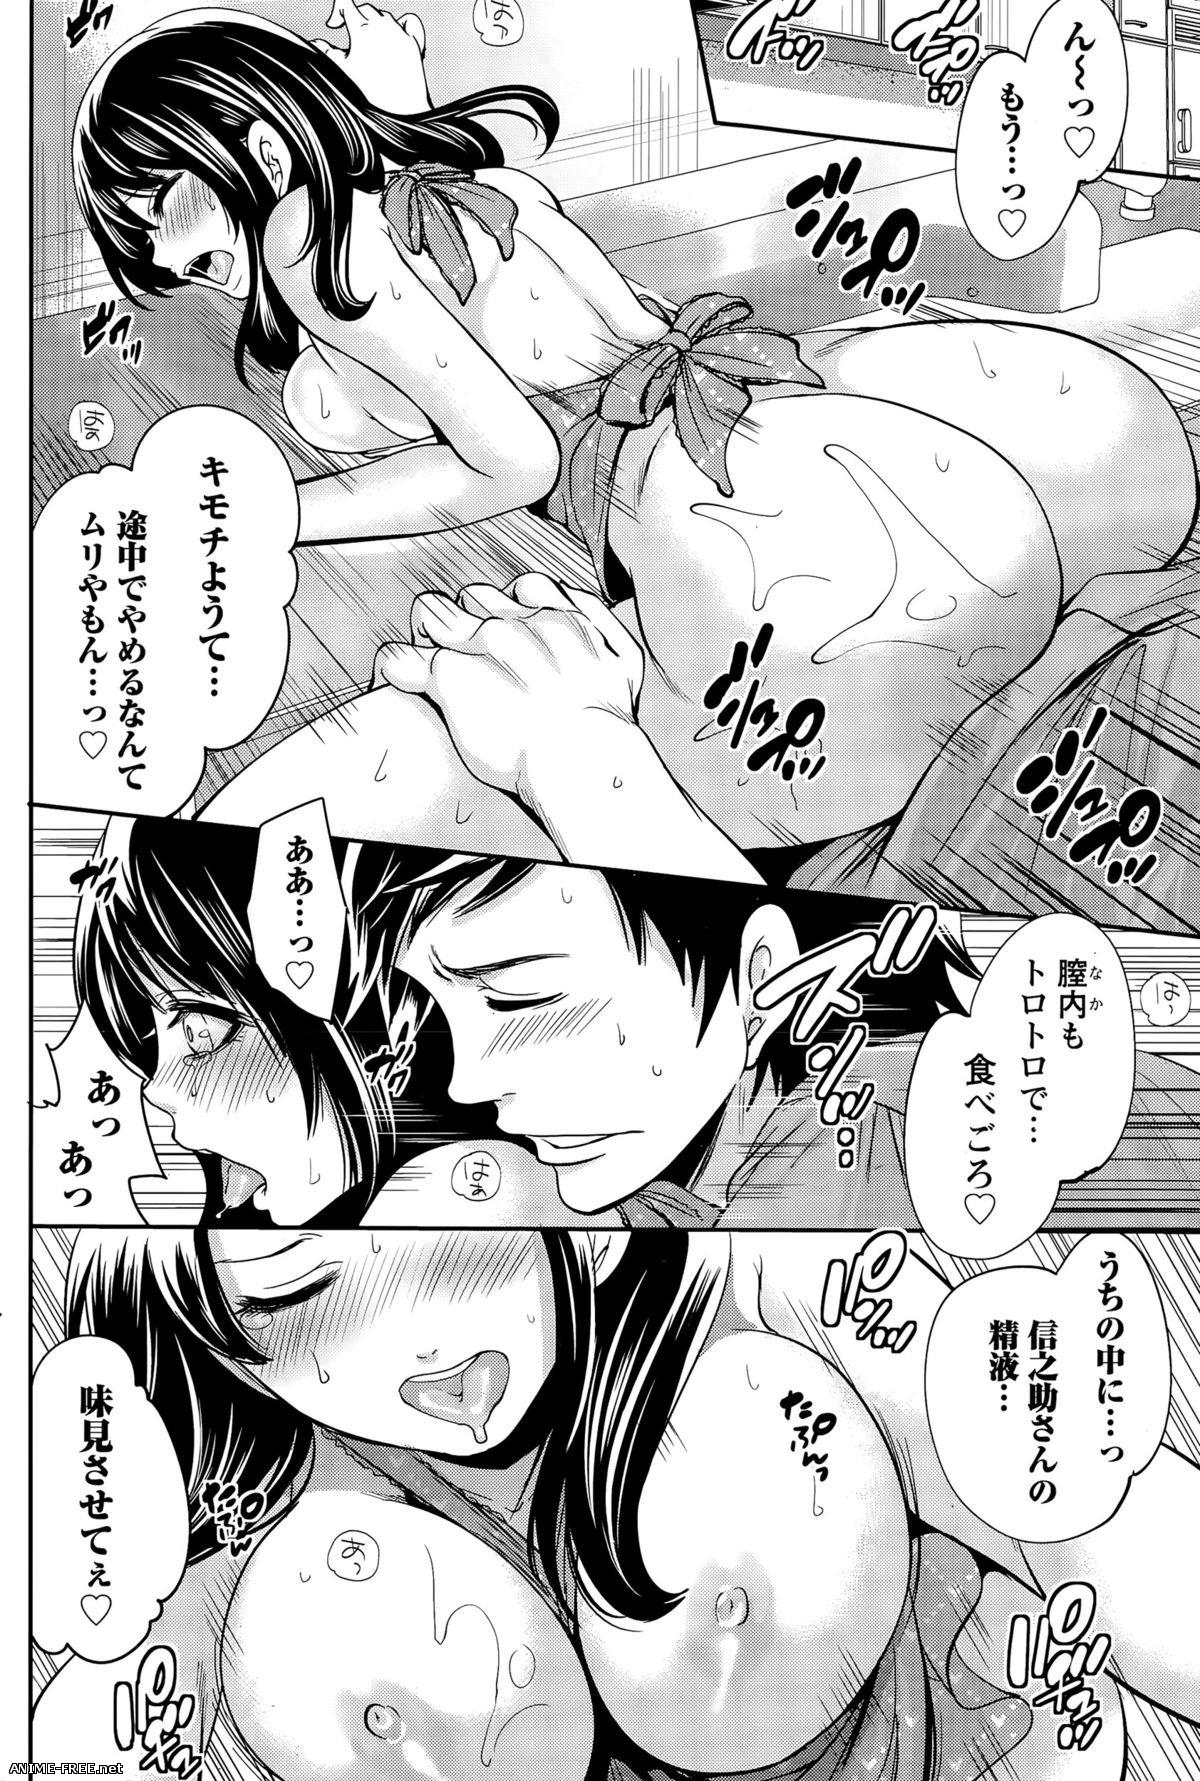 Miyahara Ayumu - Коллекция Манги [Cen] [JAP,ENG,RUS,CHI] Manga Hentai